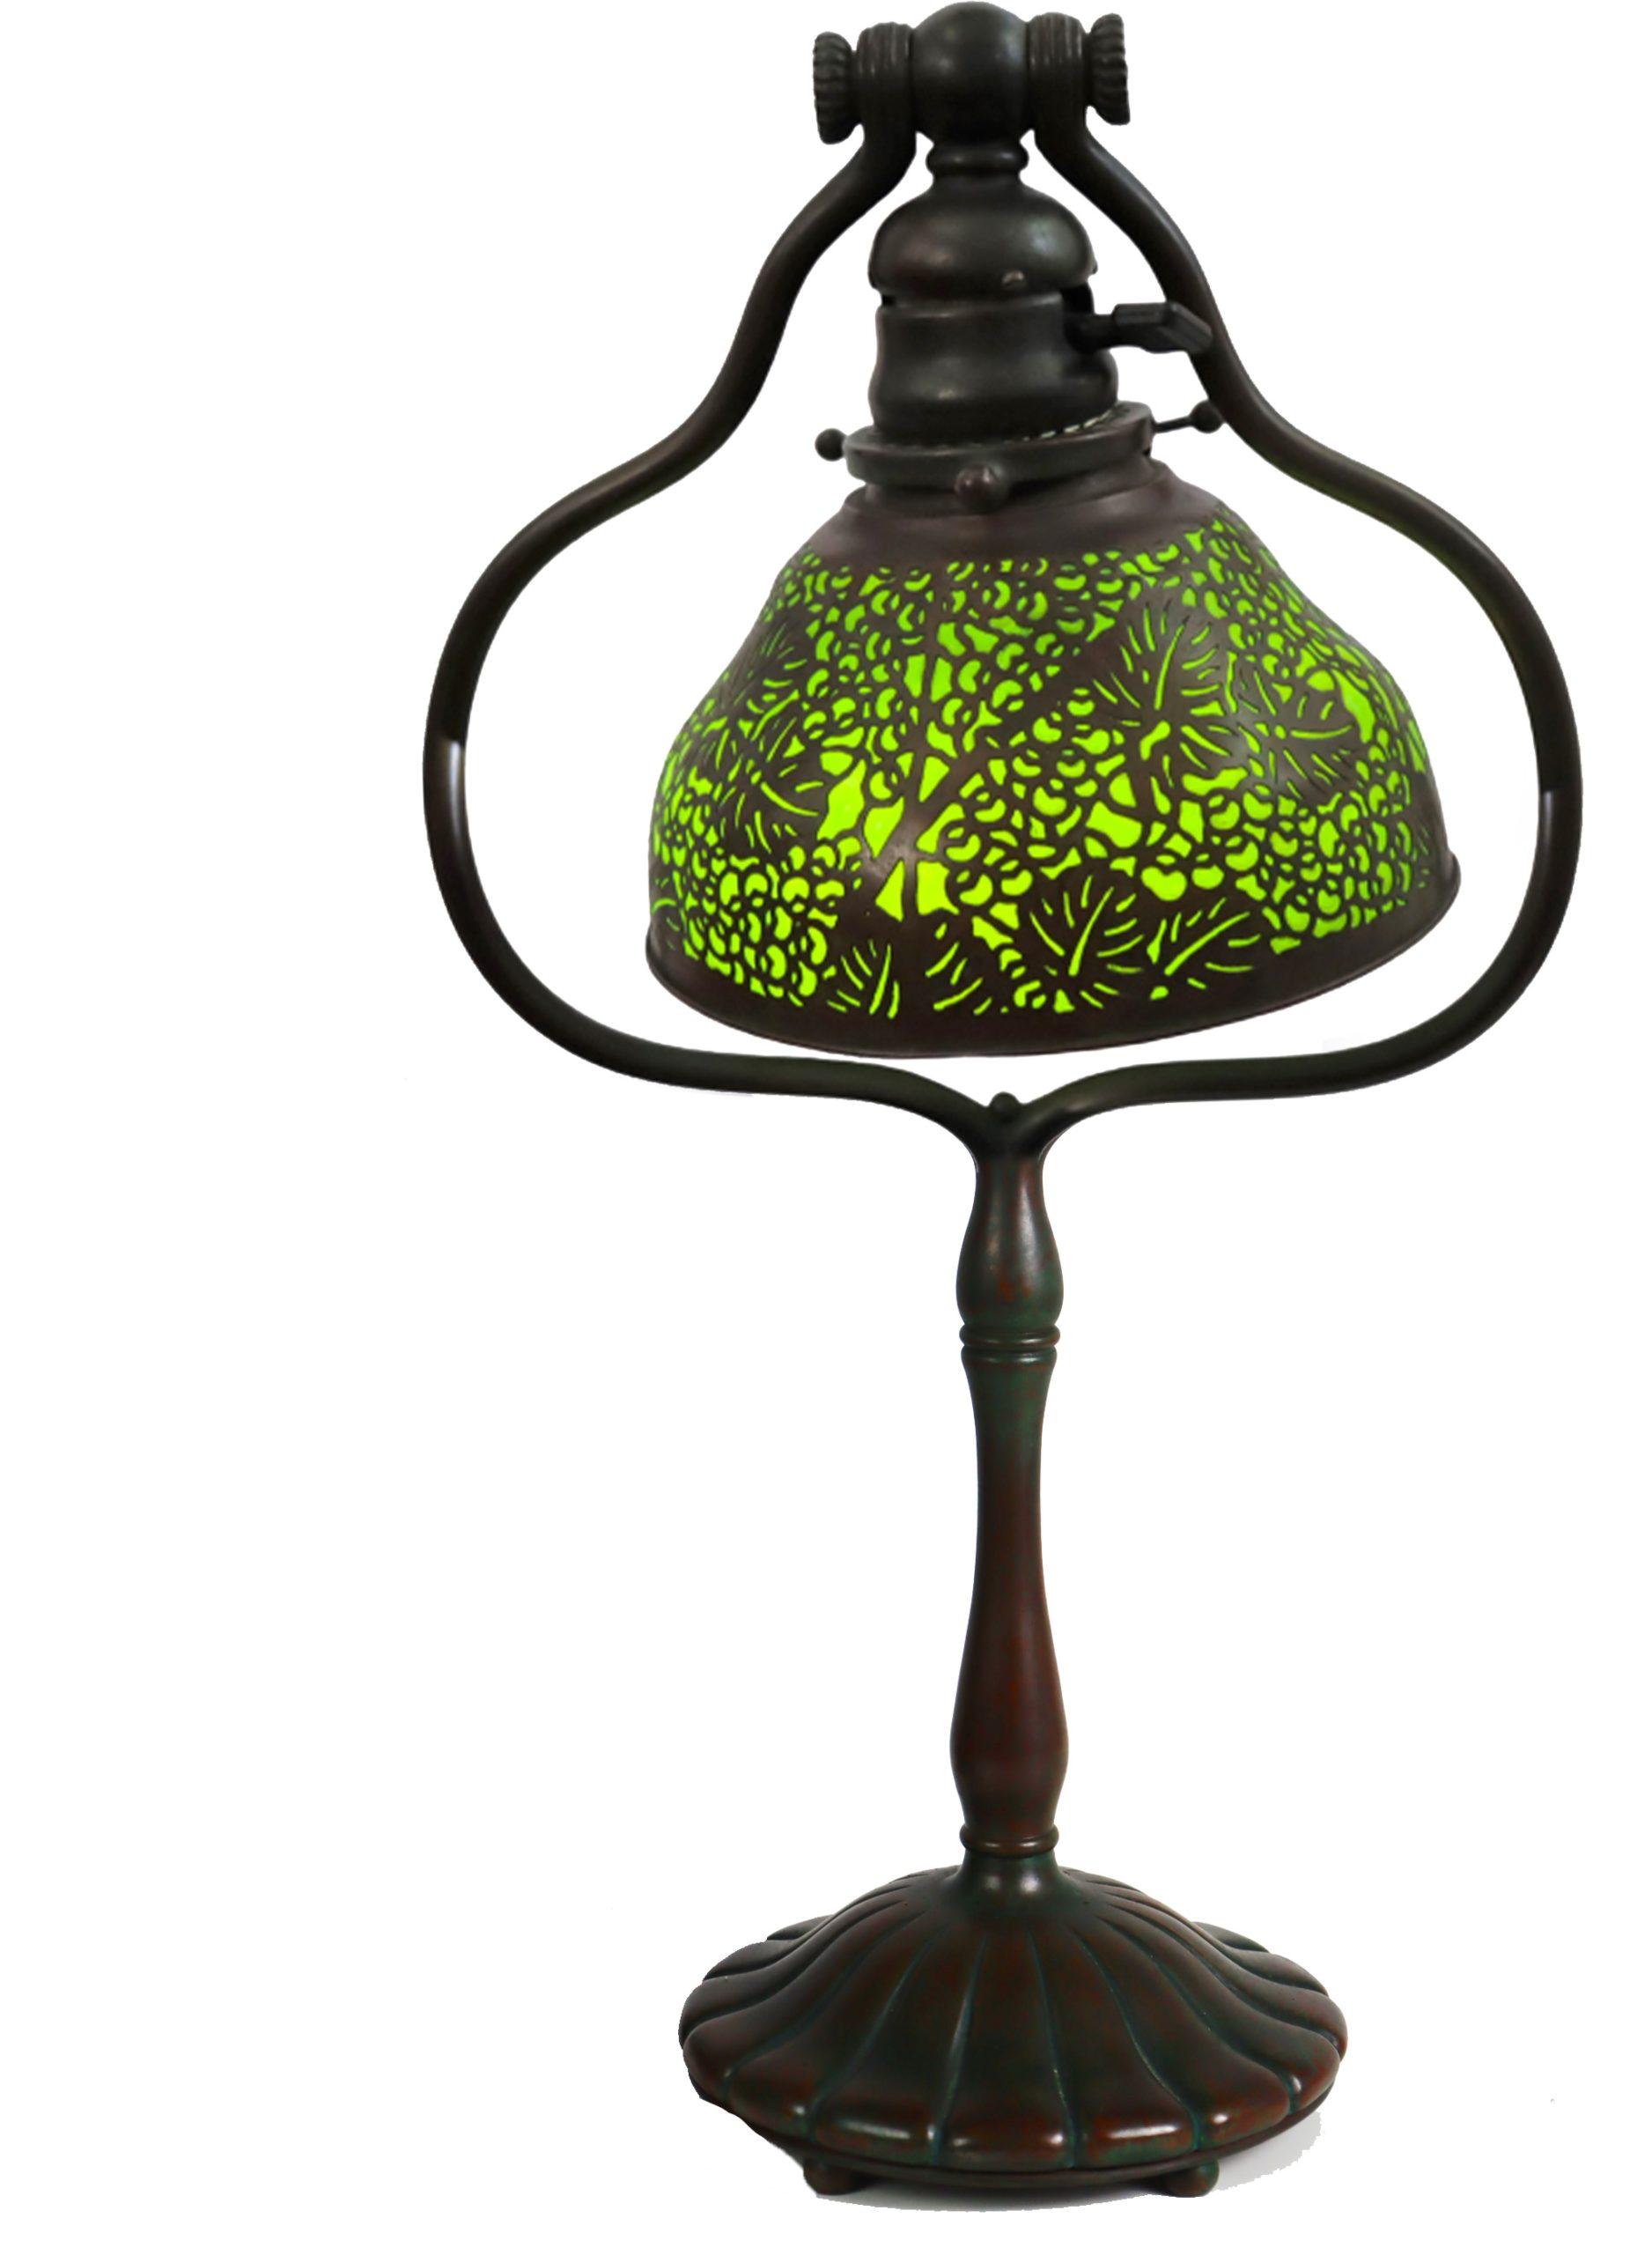 Tiffany Favrile Glass & Bronze Filigree Lamp